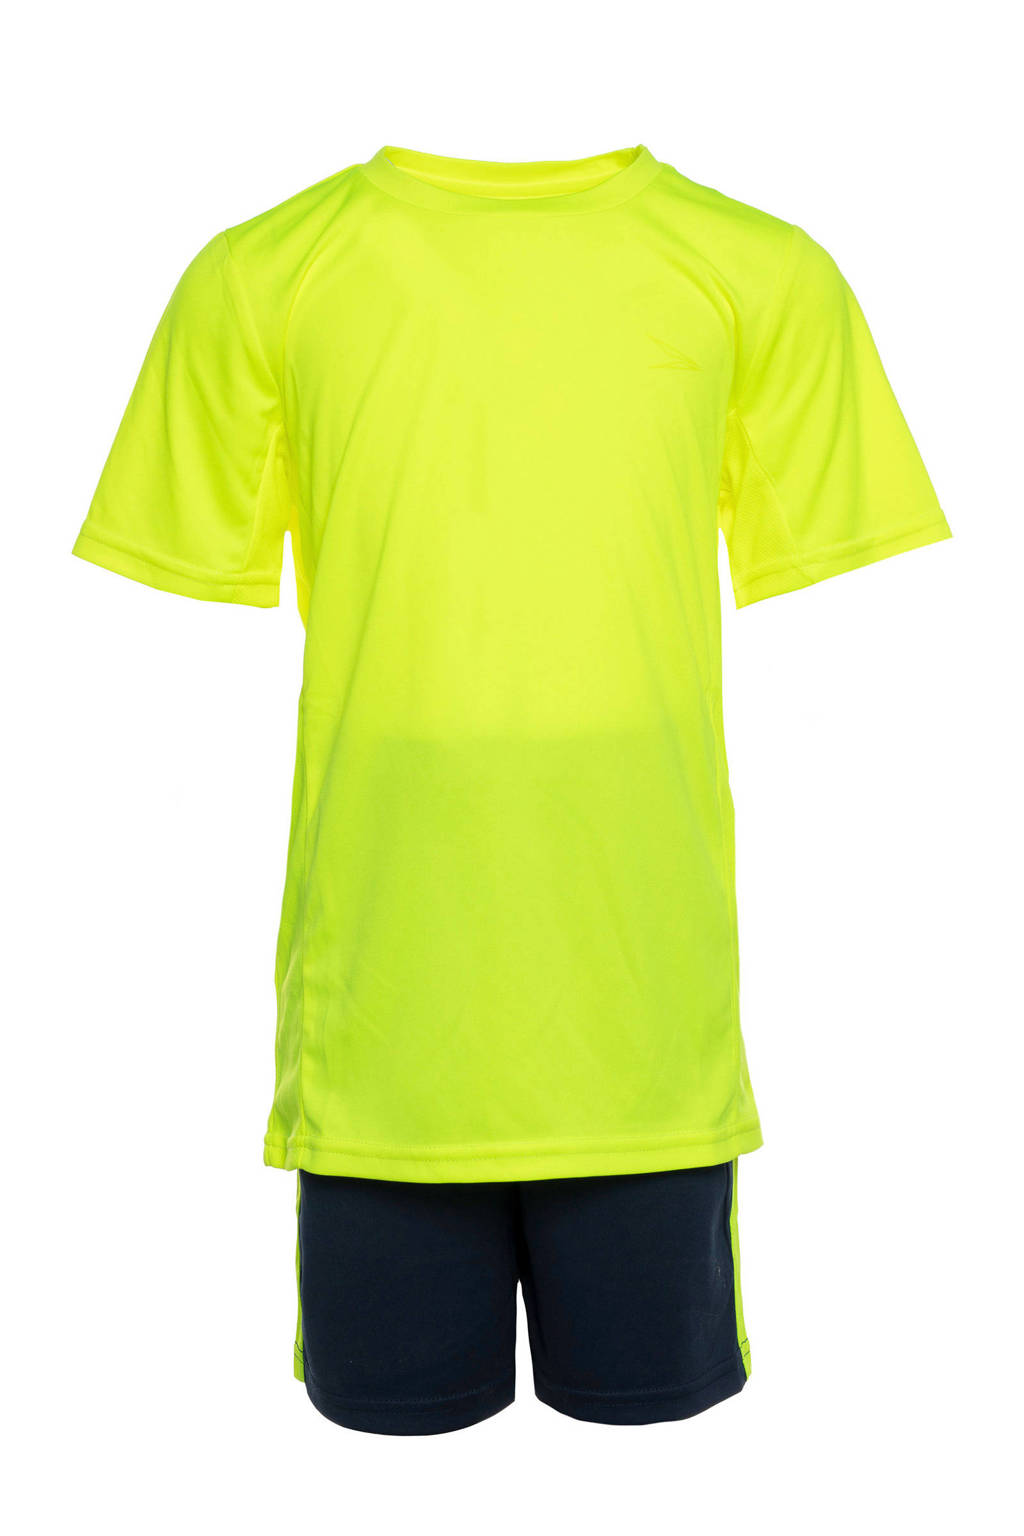 Scapino Dutchy   sportset limegroen/donkerblauw, Limegroen/donkerblauw